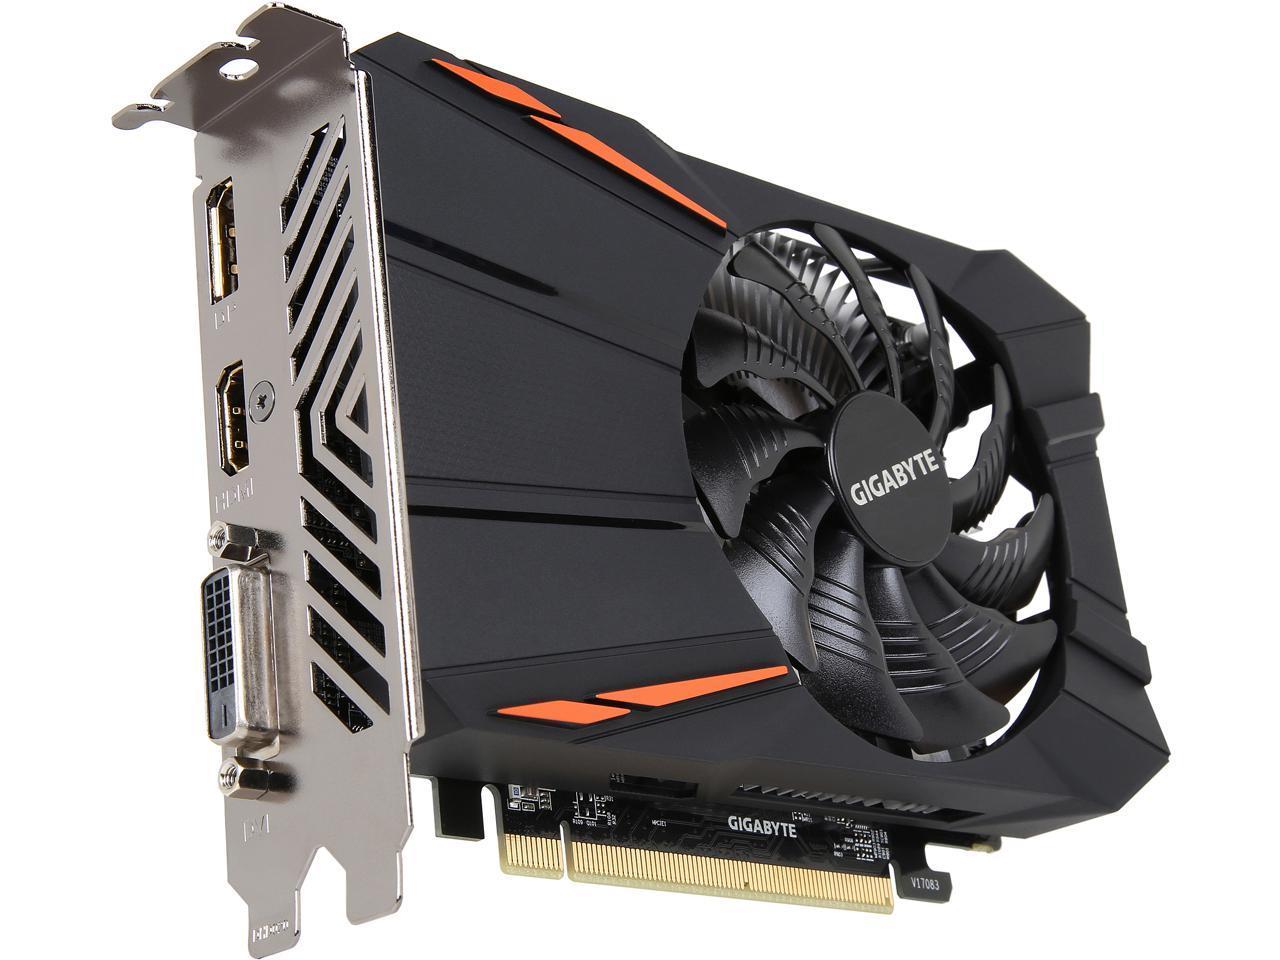 Details about GIGABYTE Radeon RX 560 14CU DirectX 12 GV-RX560OC-4GD REV2 0  4GB 128-Bit GDDR5 A